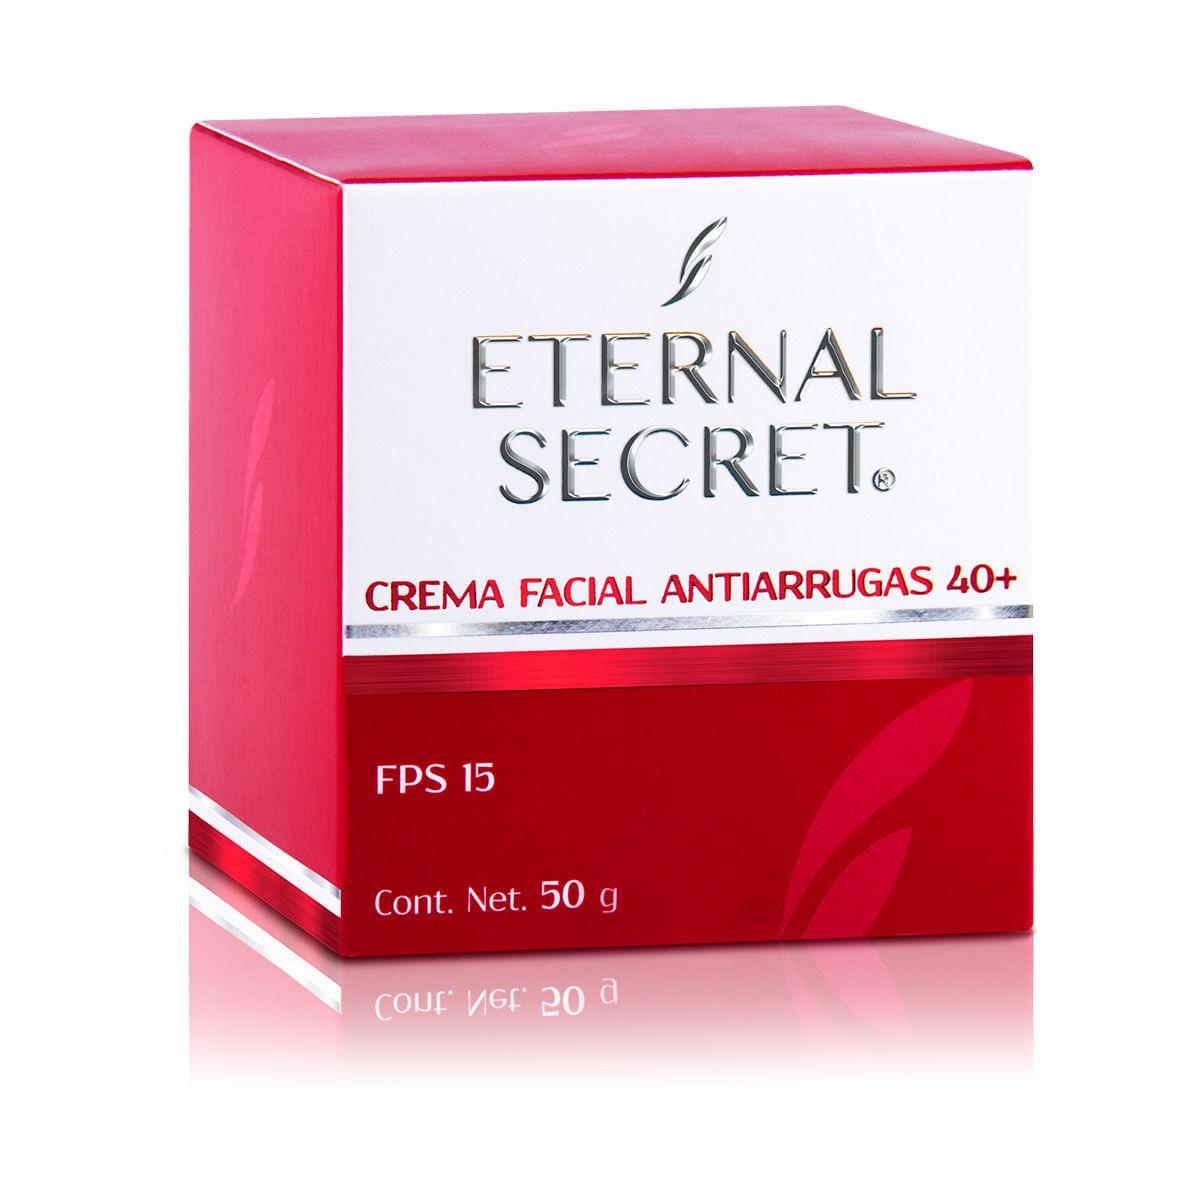 crema facial antiarrugas eternal secret